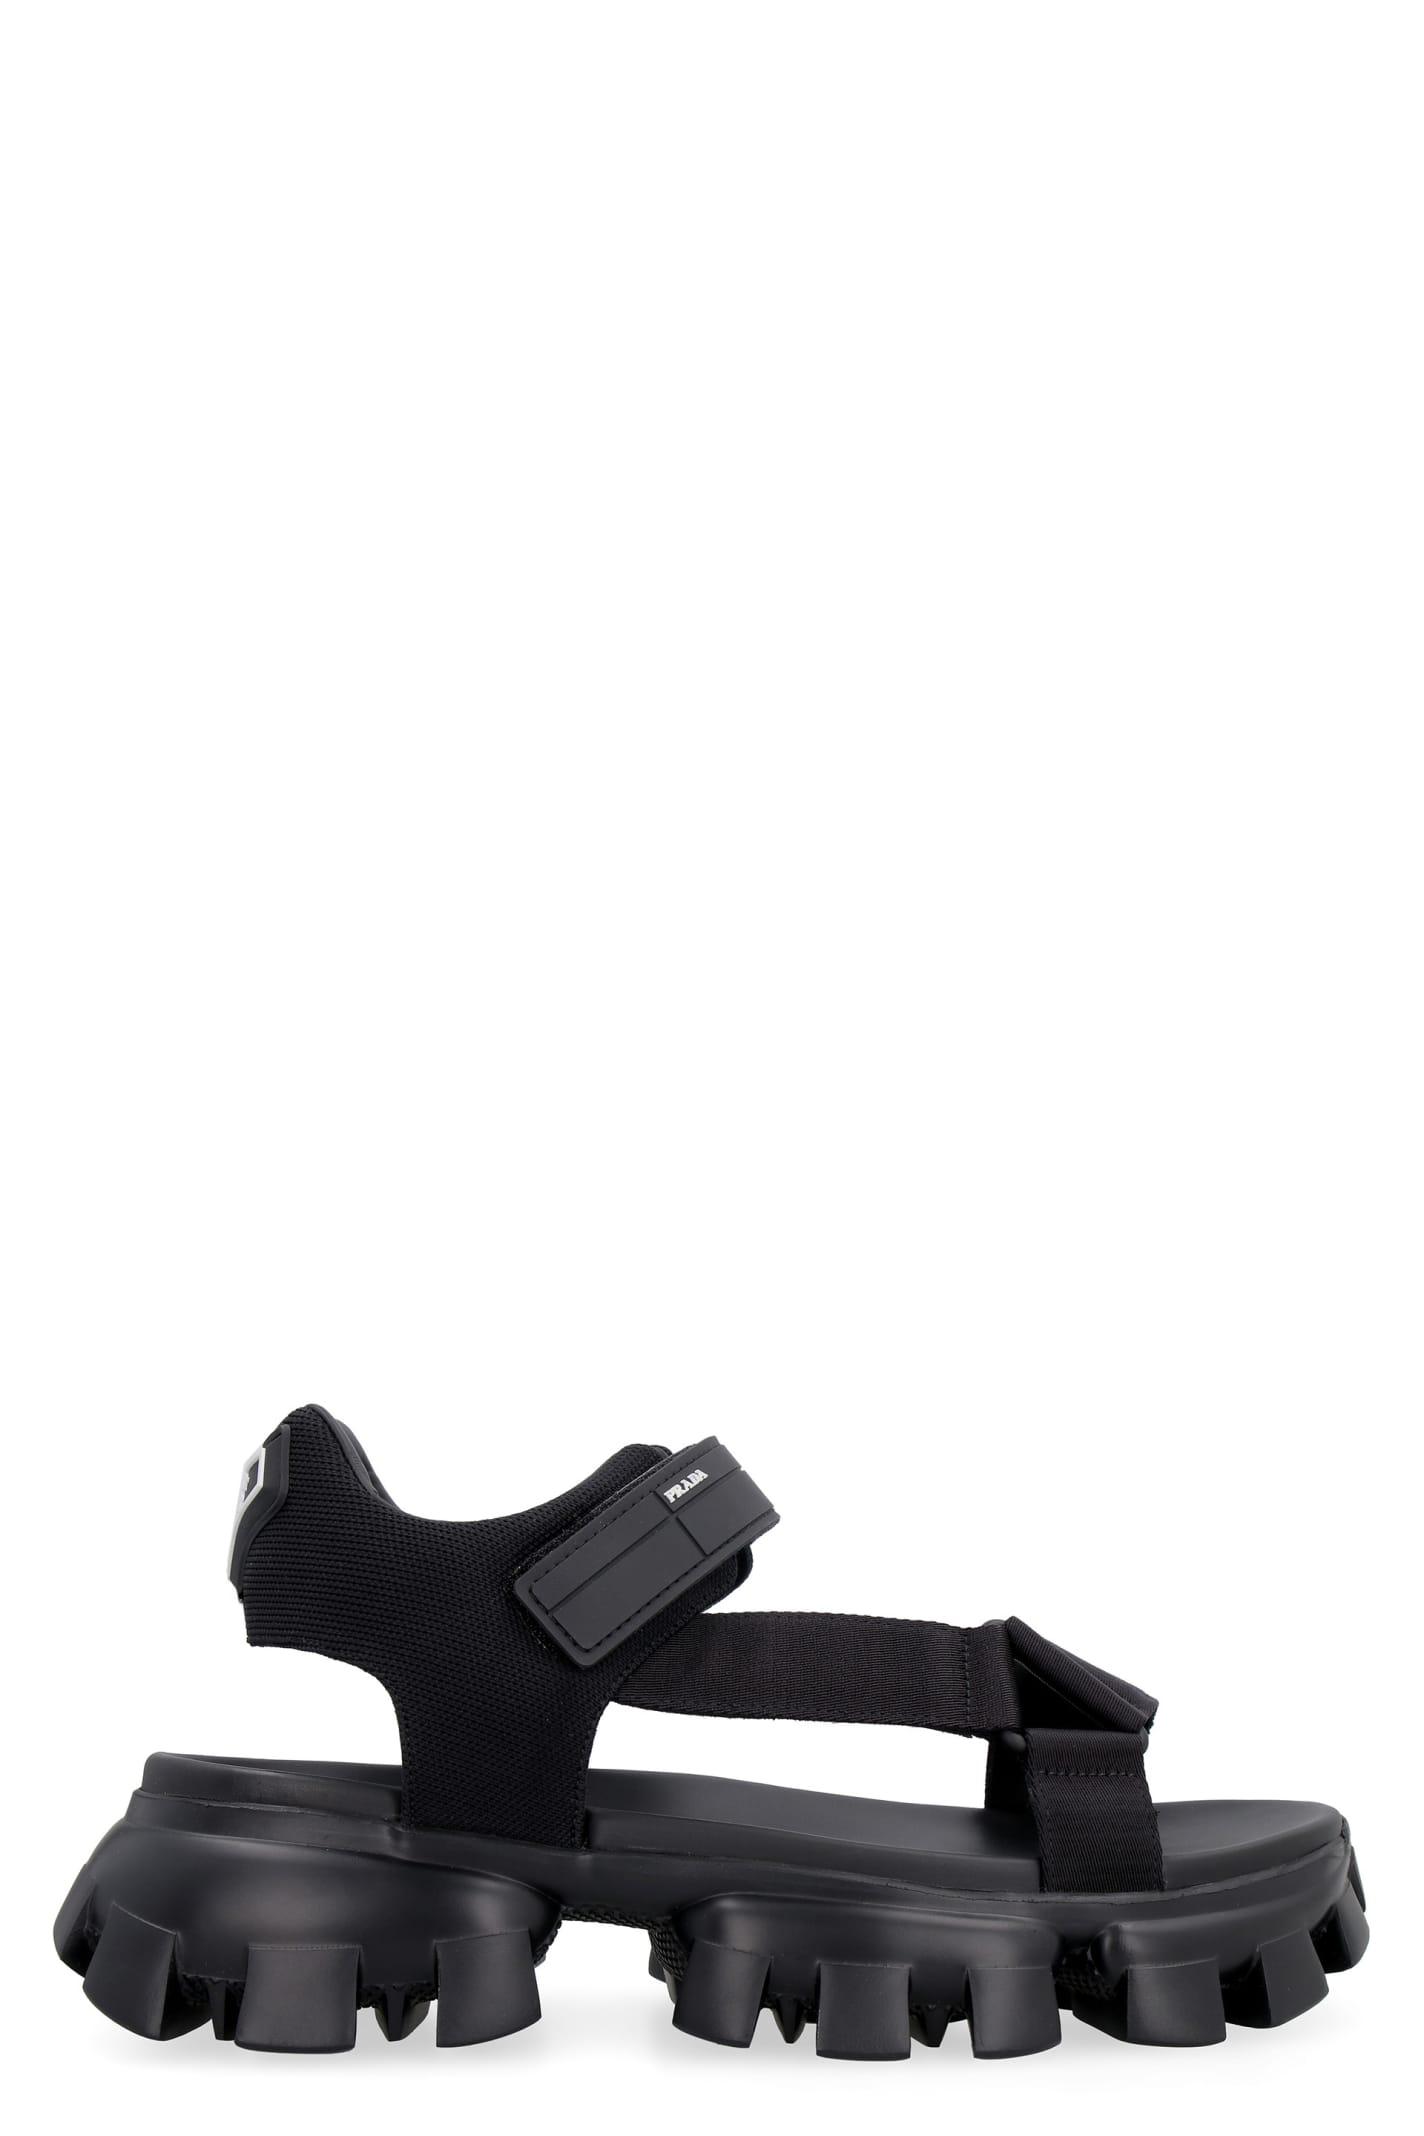 Prada Cloudbust Thunder Sport Style Strap Sandals